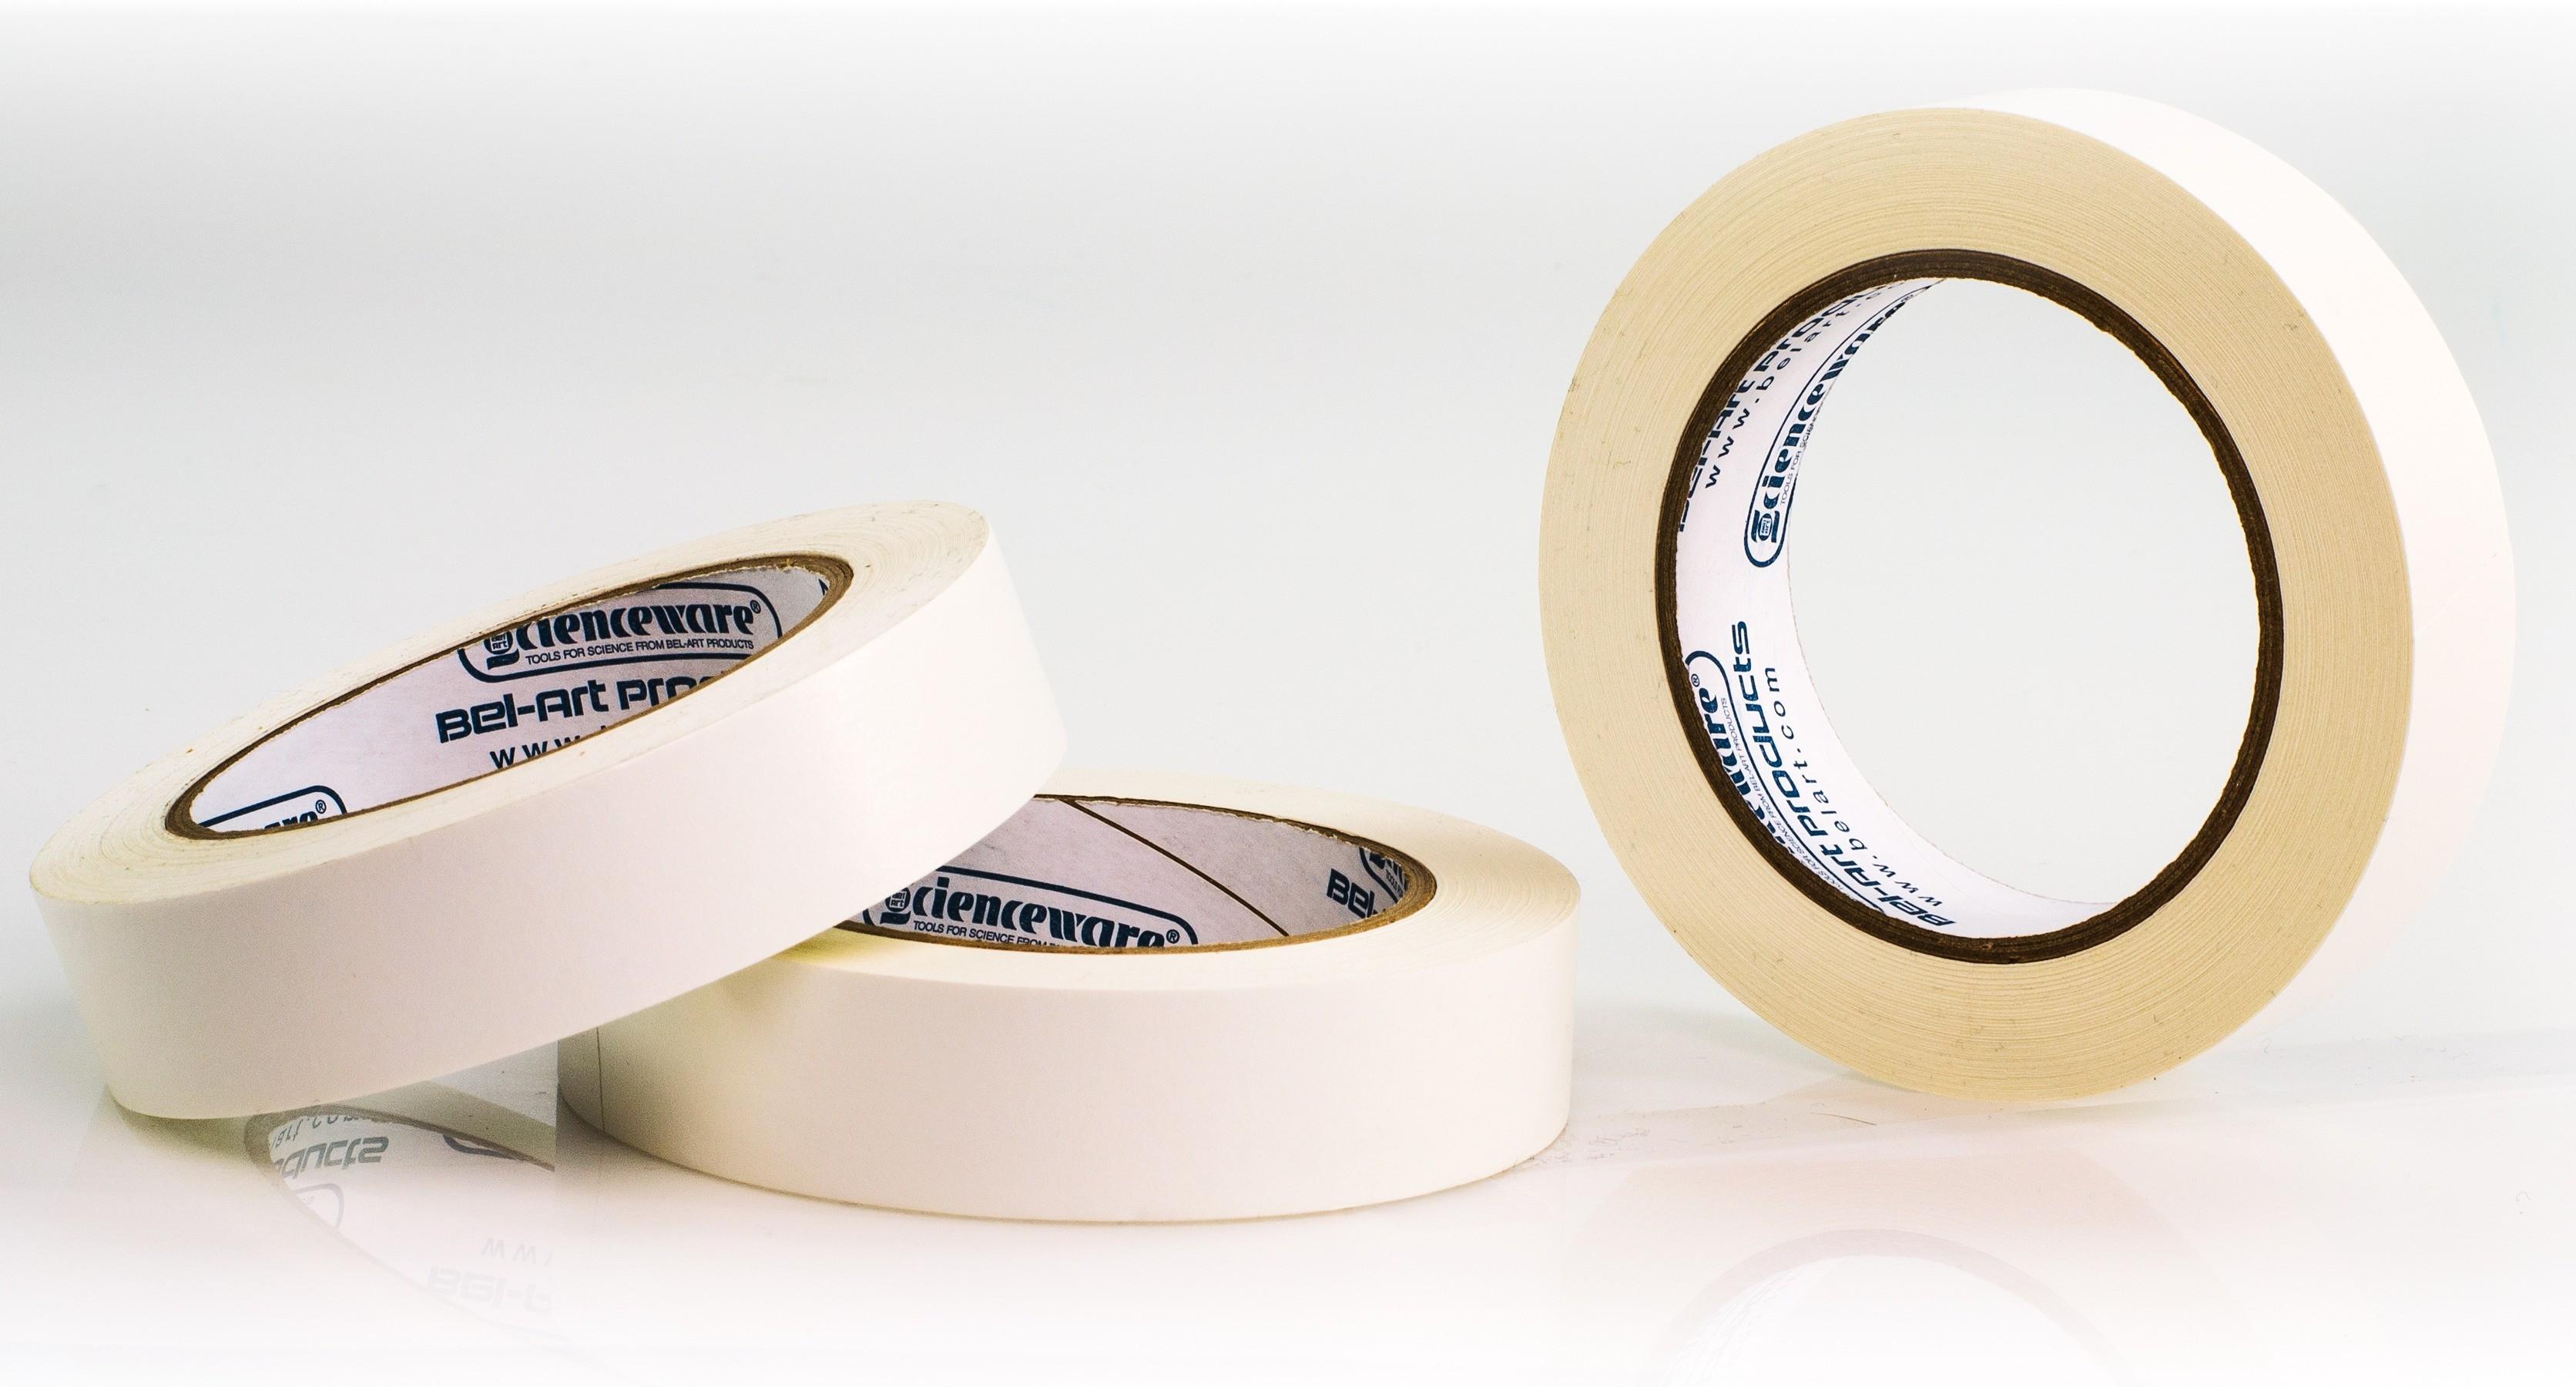 SP Bel-Art Write-On White Label Tape; 40yd Length, 1 in. Width, 3 in. Core (Pack of 3)